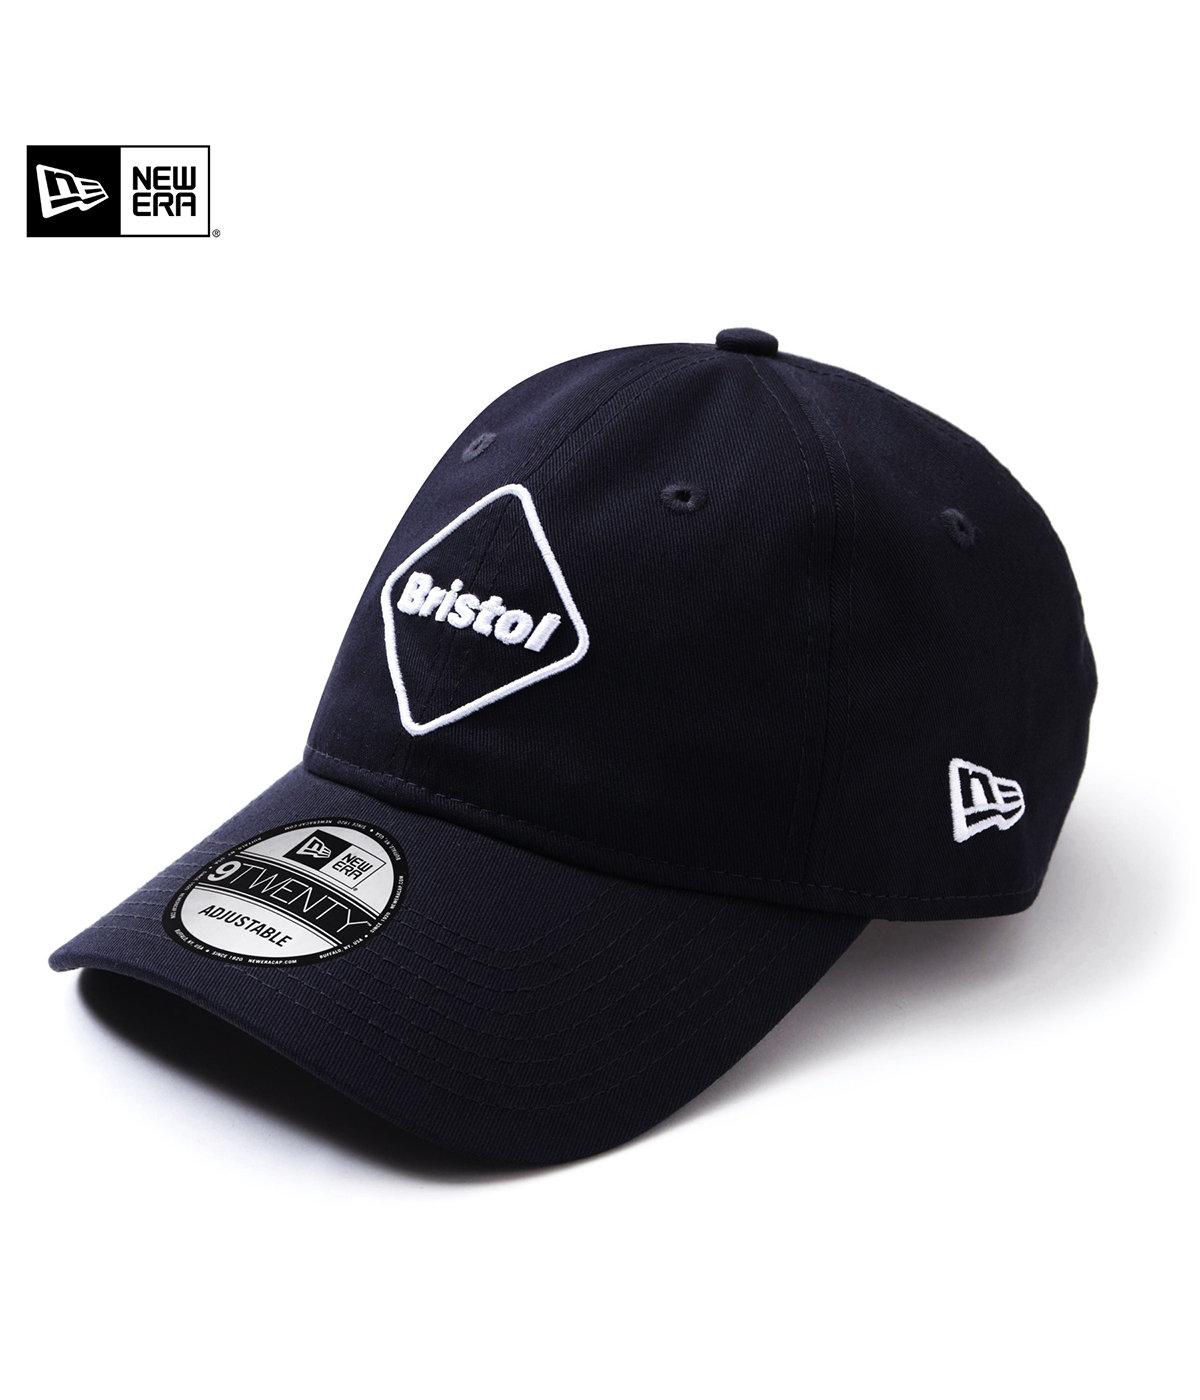 NEW ERA EMBLEM 9TWENTY CAP